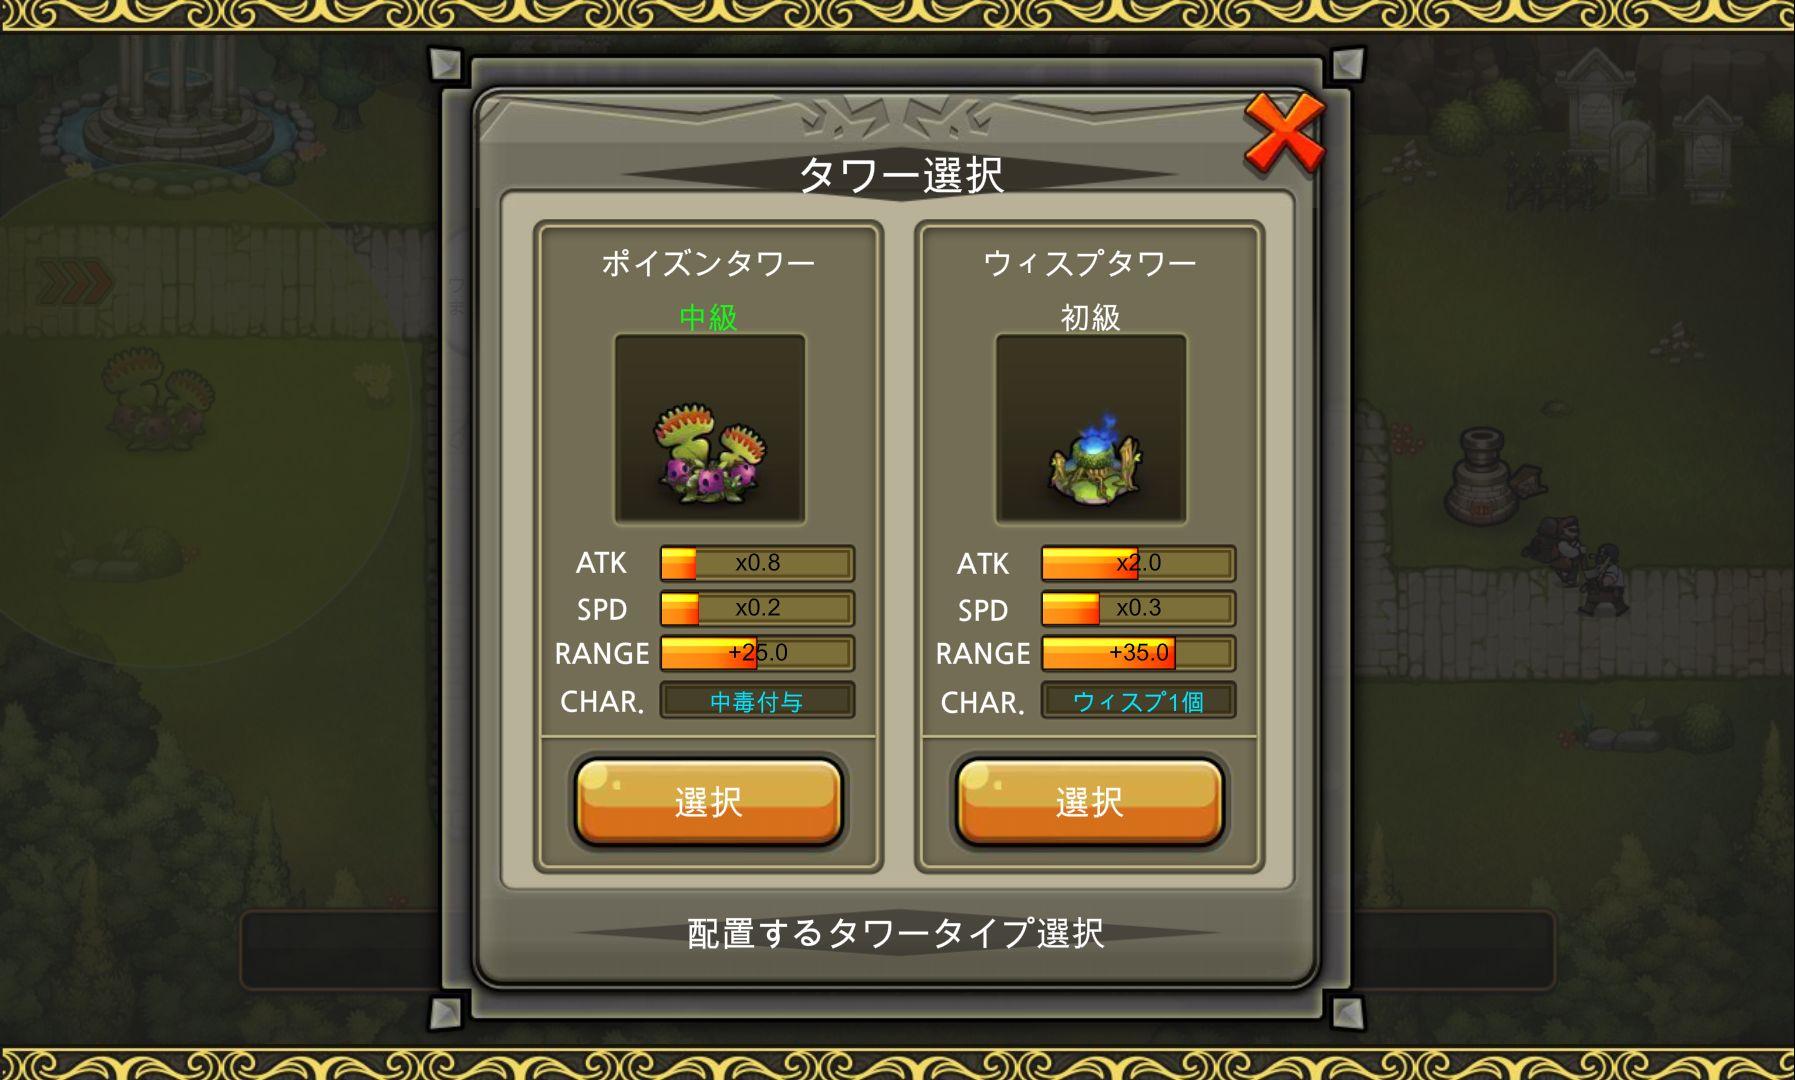 androidアプリ 究極 防衛 マスター攻略スクリーンショット3